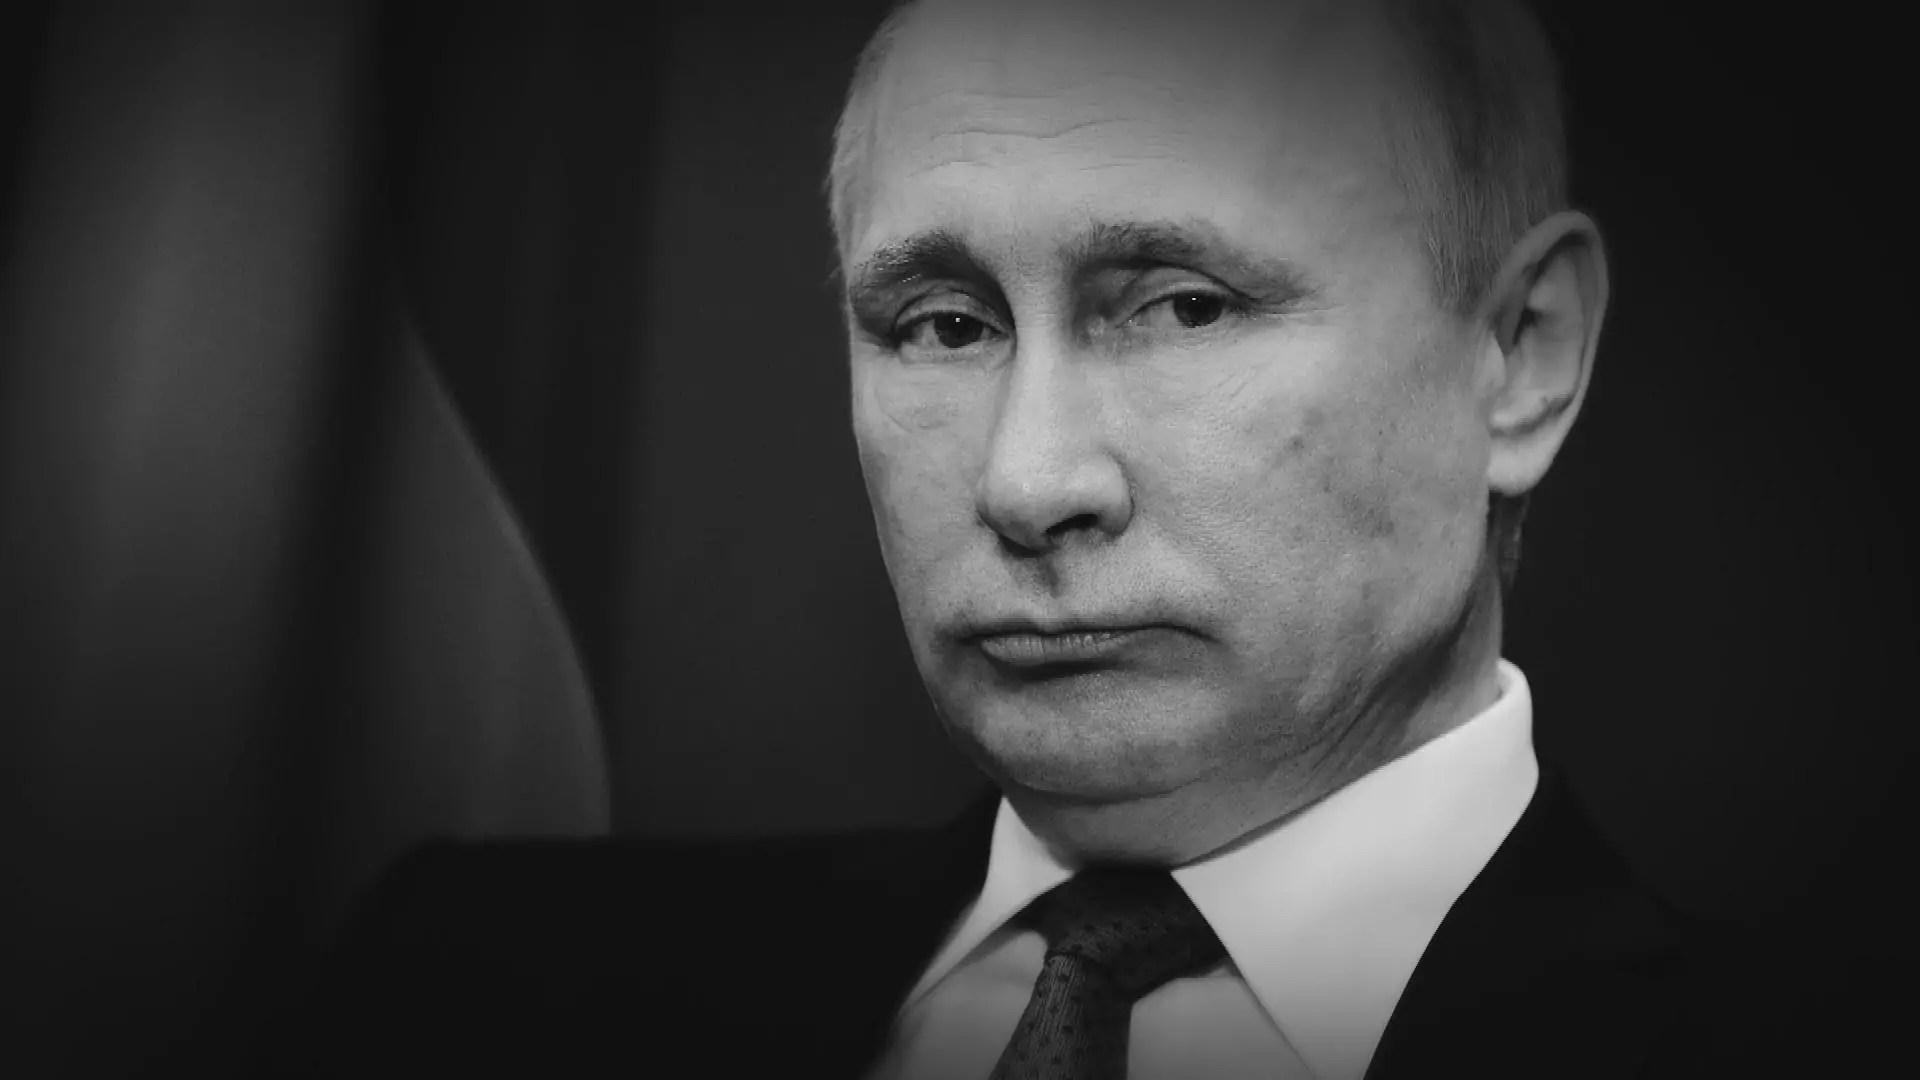 Portrait of Vladimir Putin.